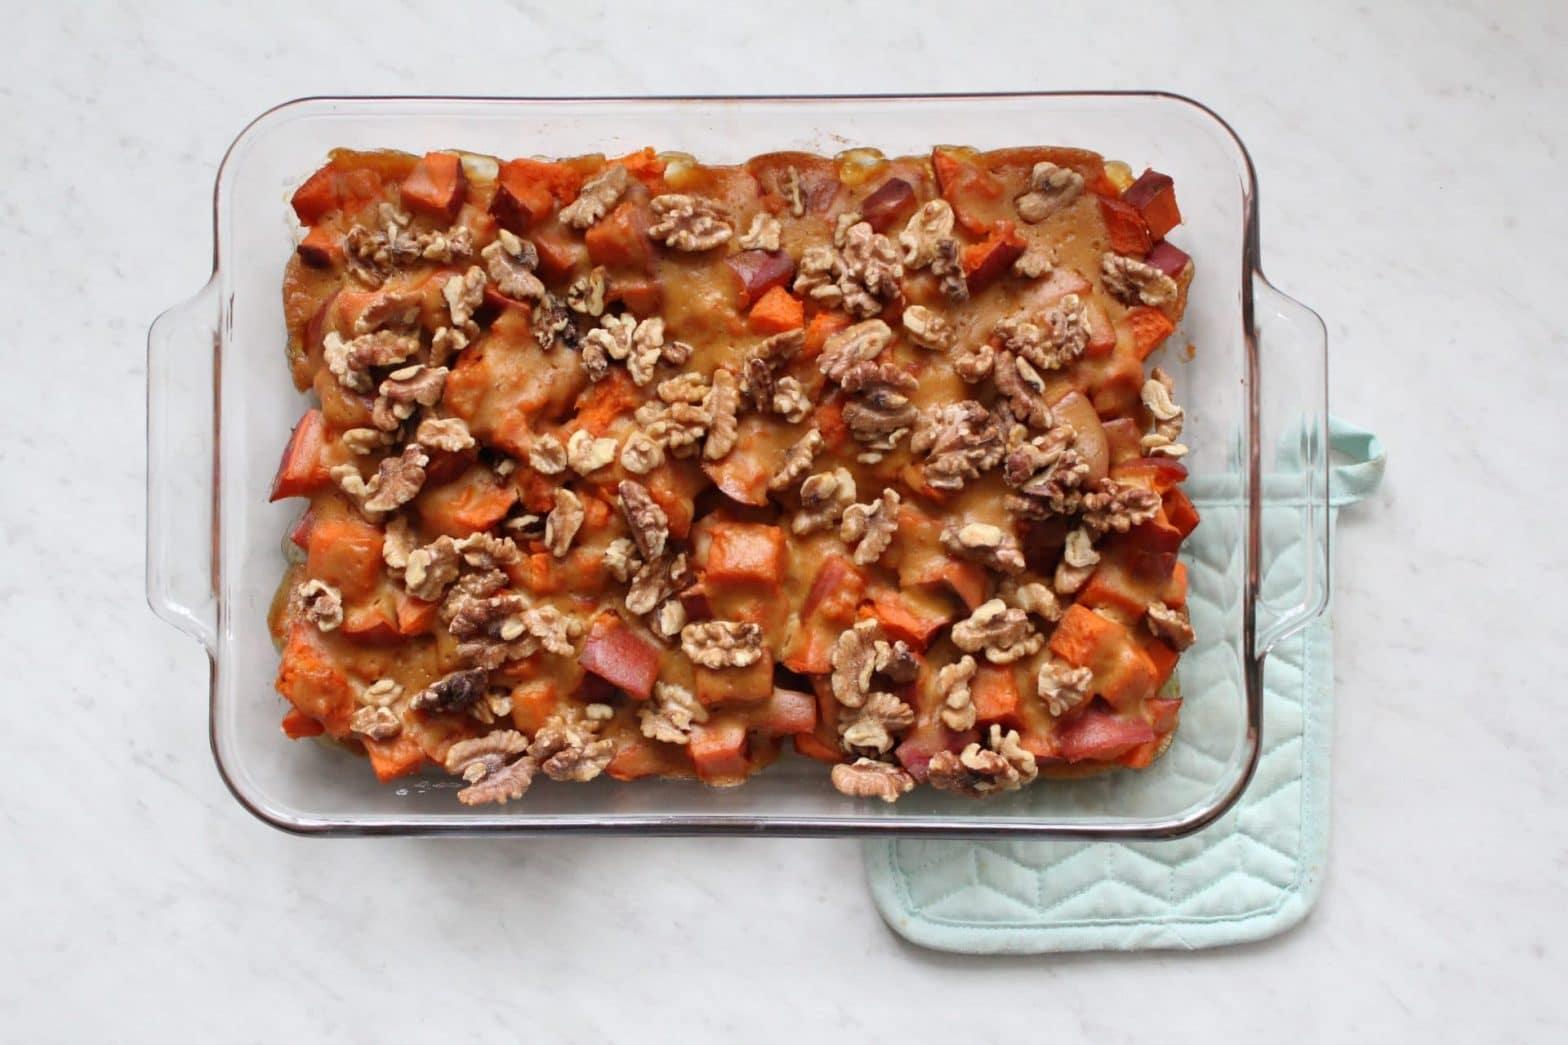 Paleo + Whole30 Sweet Potato Casserole Recipe